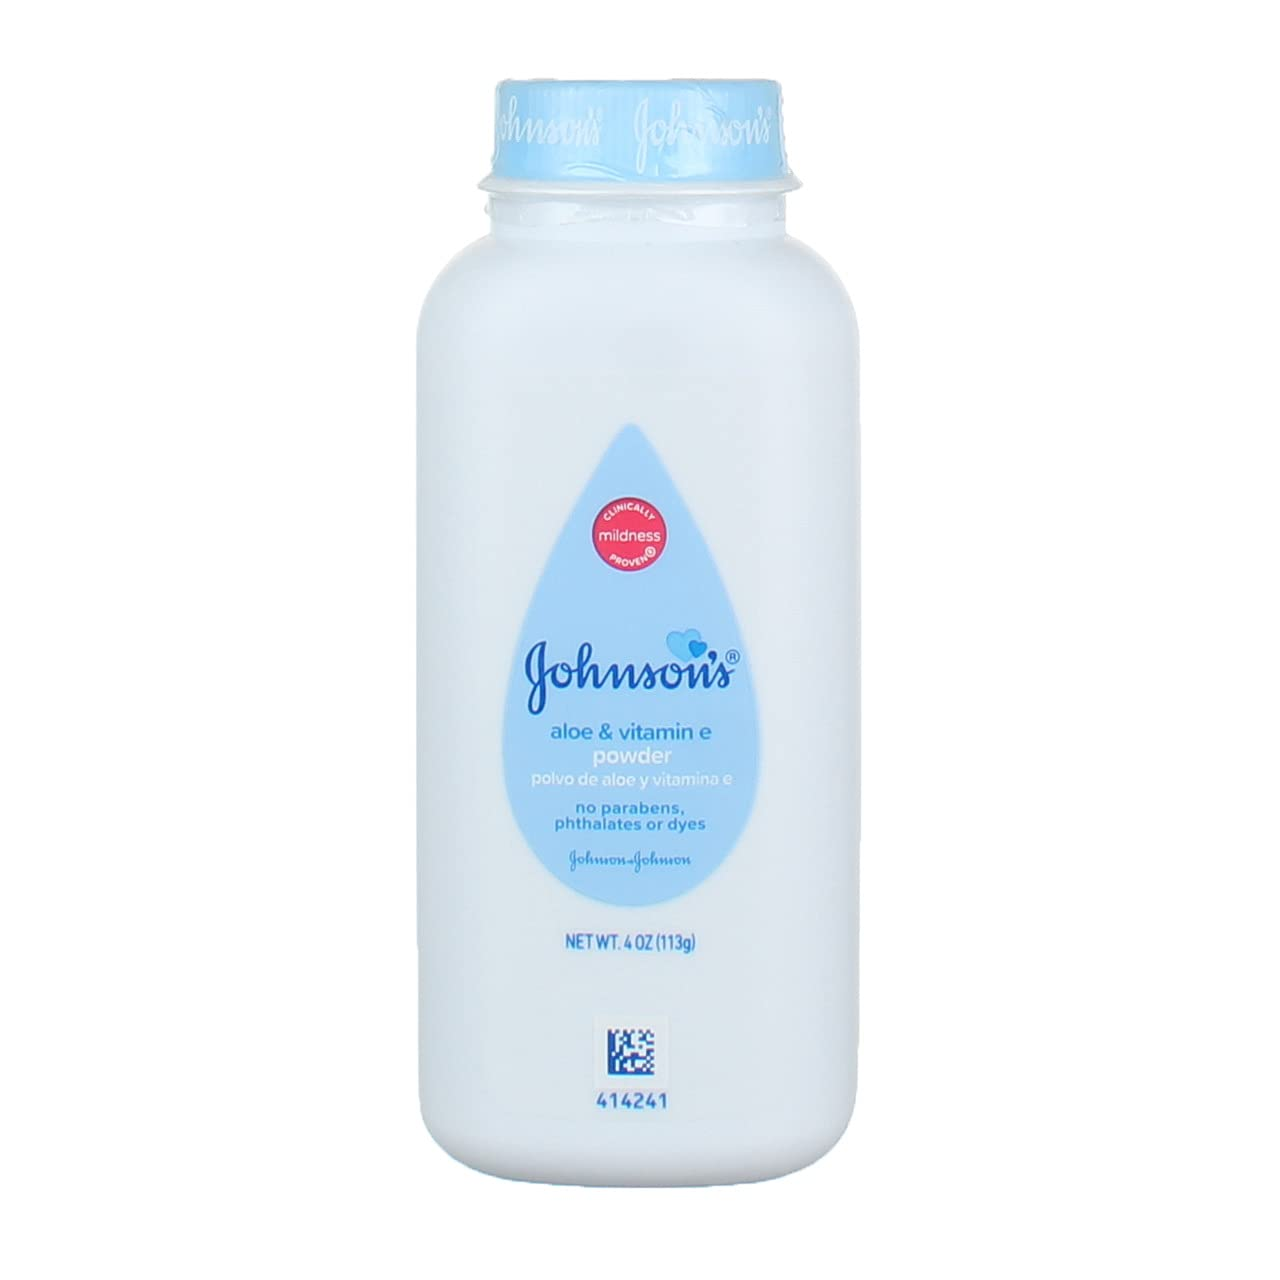 JOHNSON'S Baby Powder, Soothing Aloe & Vitamin E 4 oz (Pack of 2)